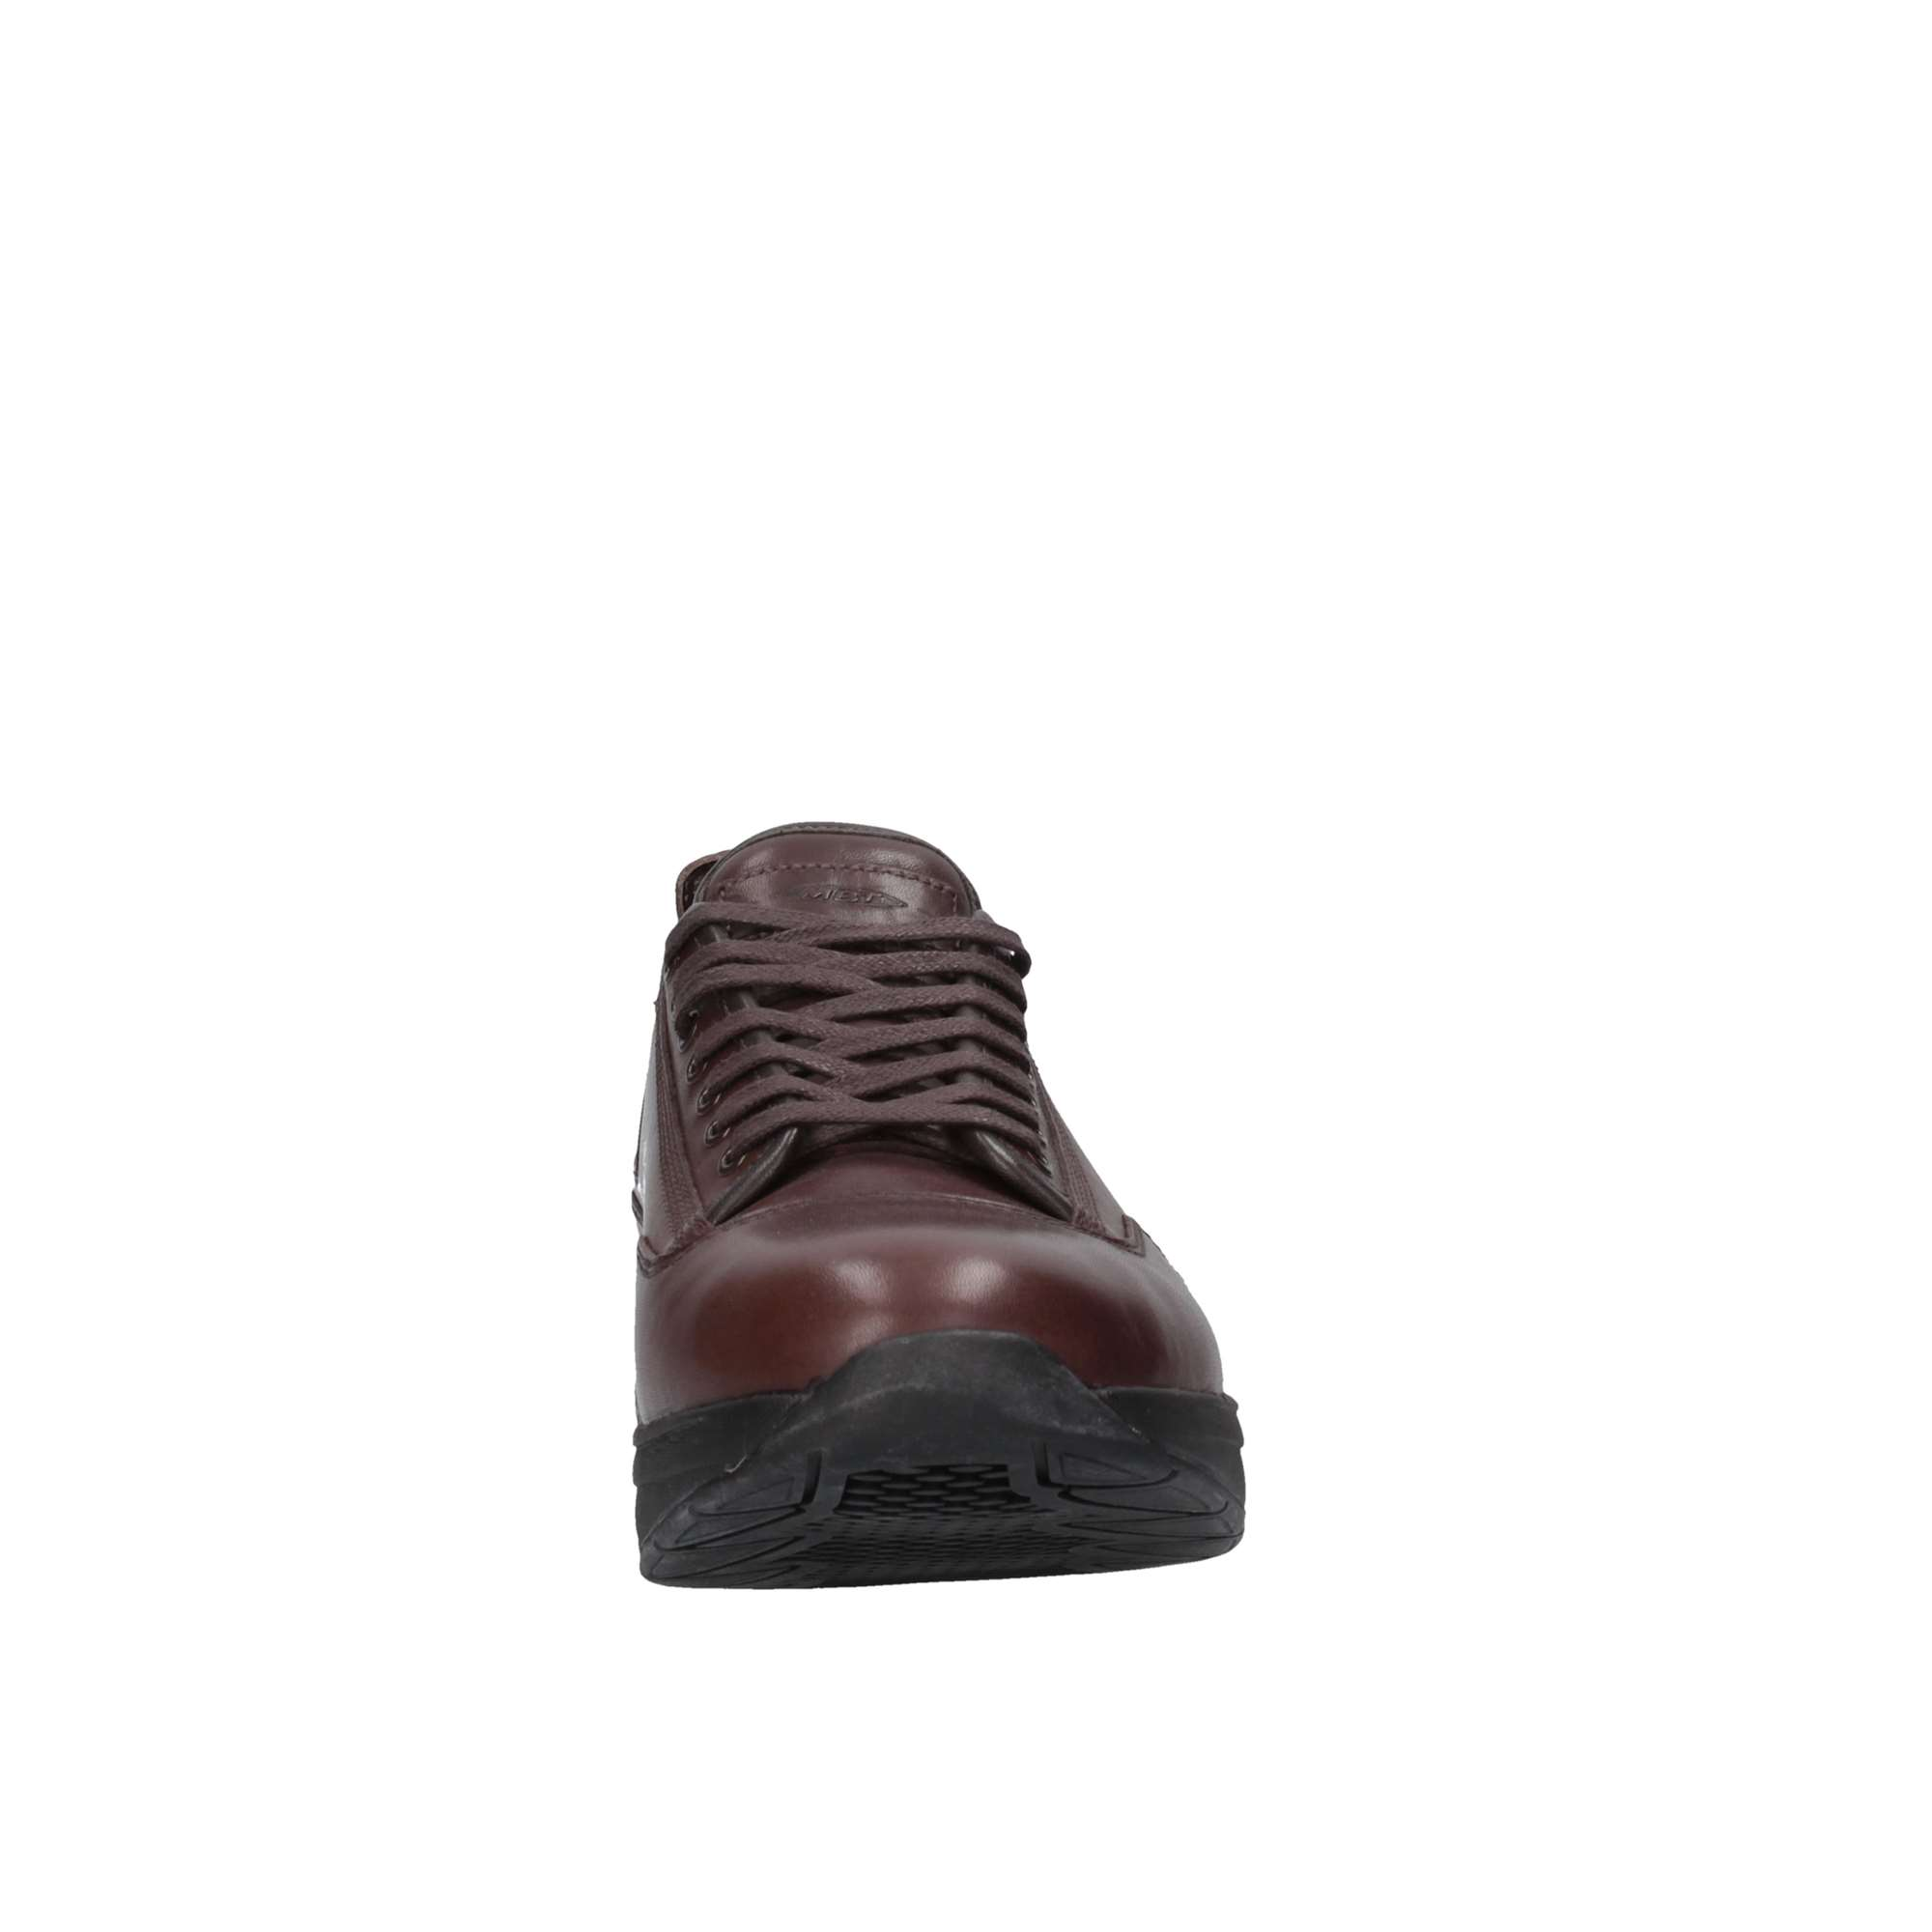 Firetrap Chaussures Hommes Chaussures De Sport Chaussures Trainers De Course Baskets Trainers Chaussures Jogging 229 136a39